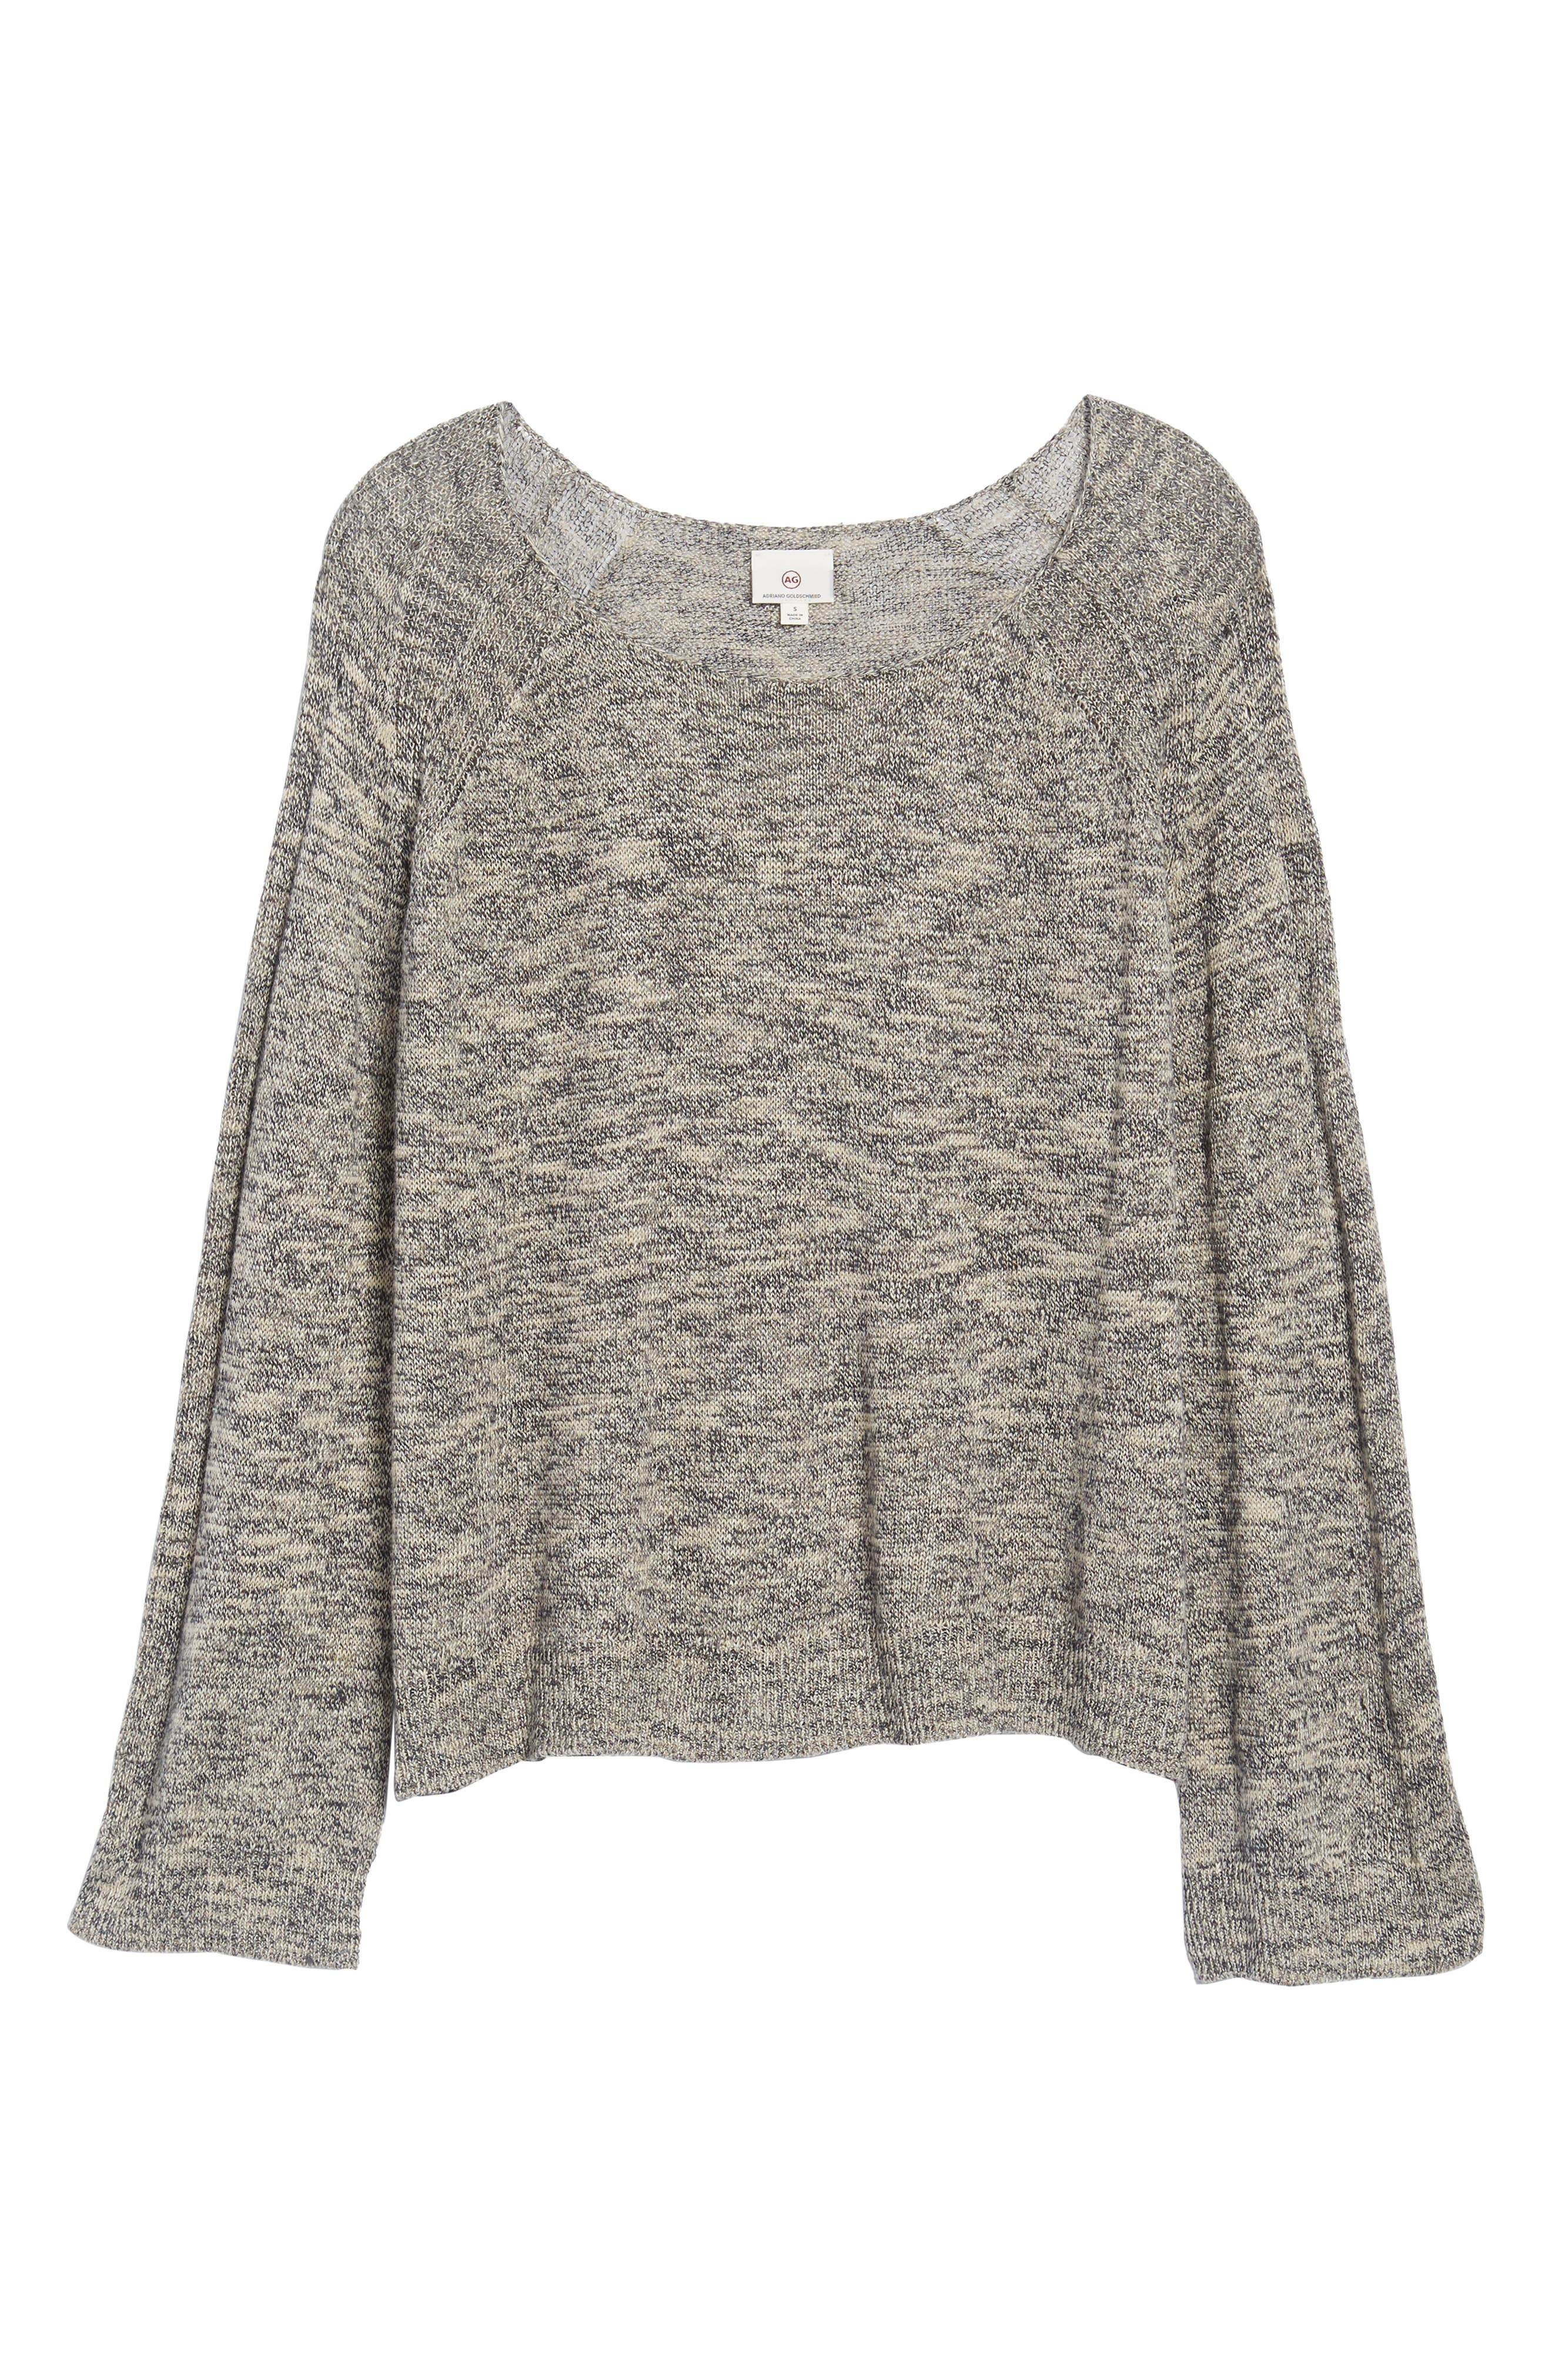 Flora Sweater,                             Alternate thumbnail 6, color,                             Speckled Navy/ Beige